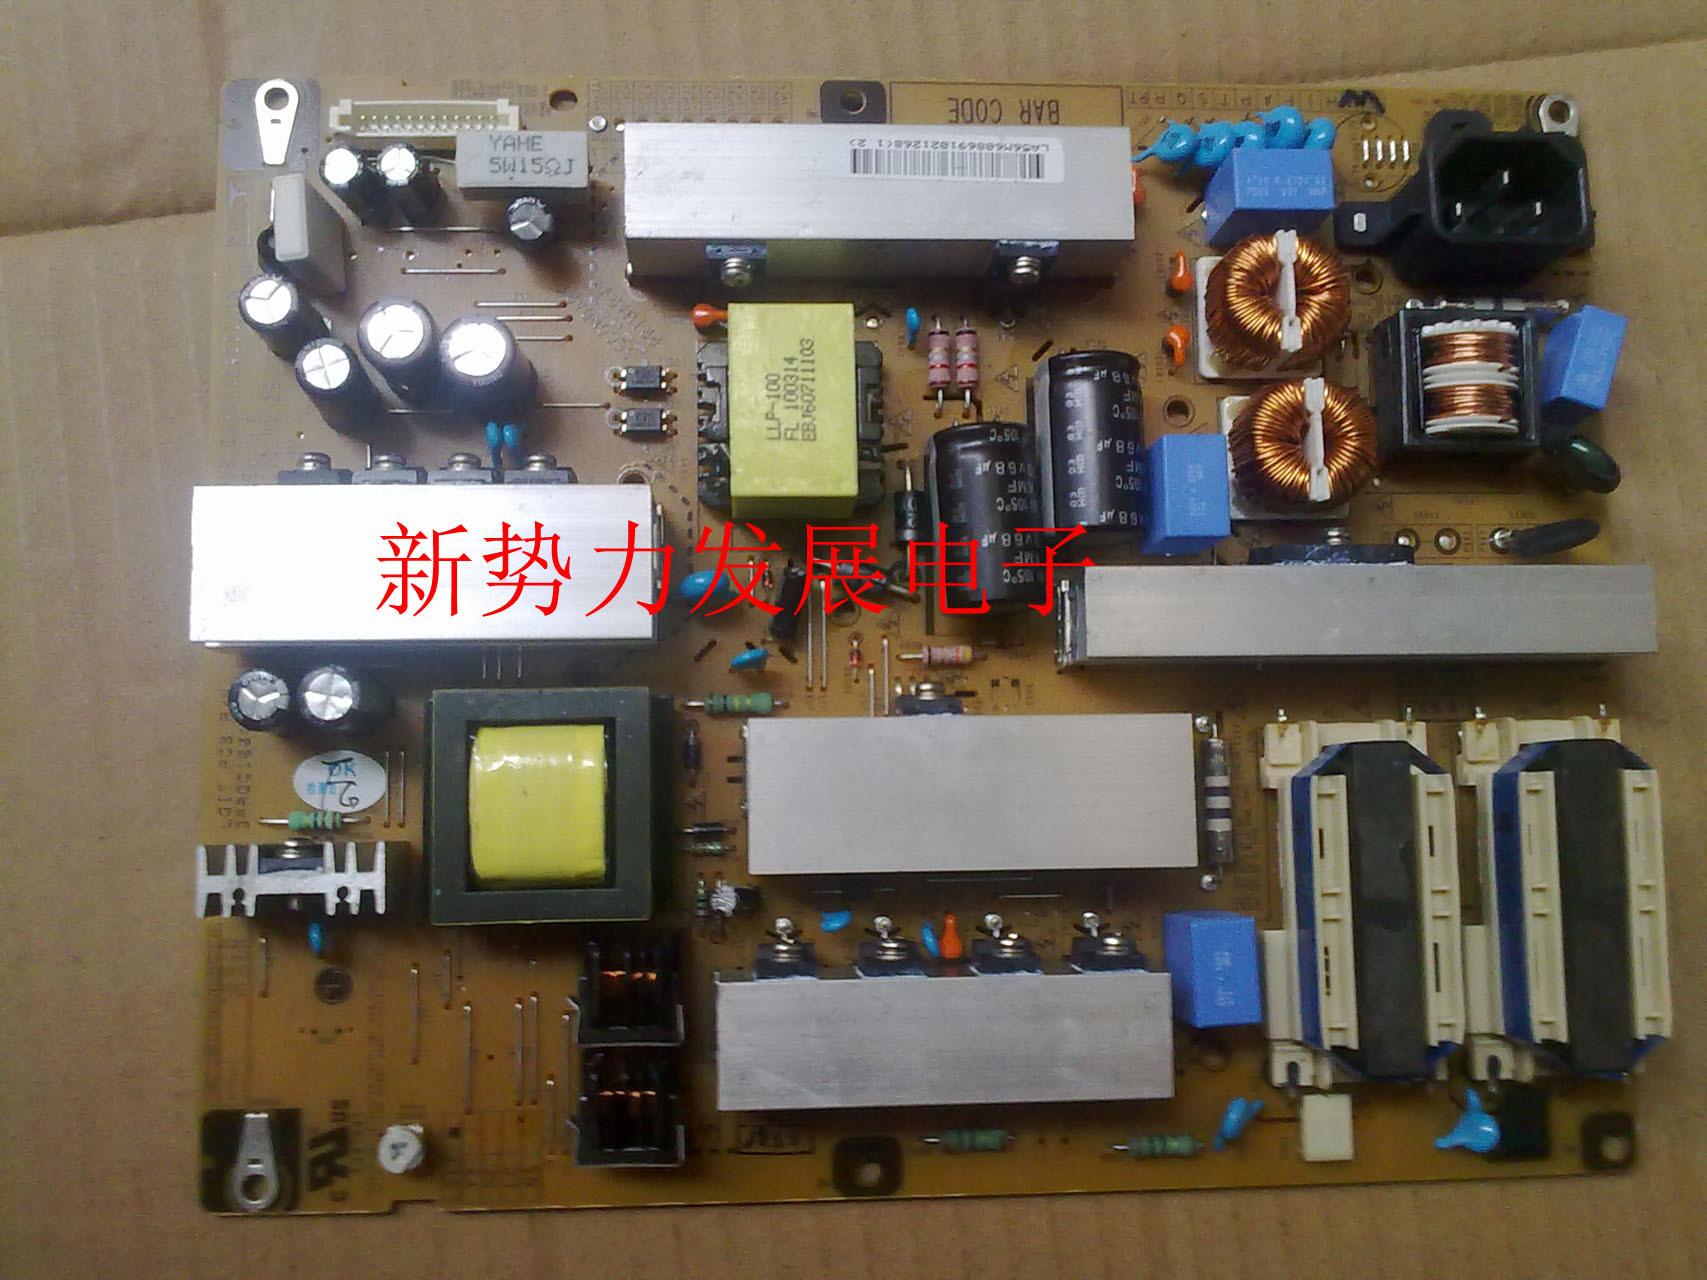 Reparatur der Platte LG42LK460-CC Power Board EAX61124201/16/14/15 lg LCD - TV